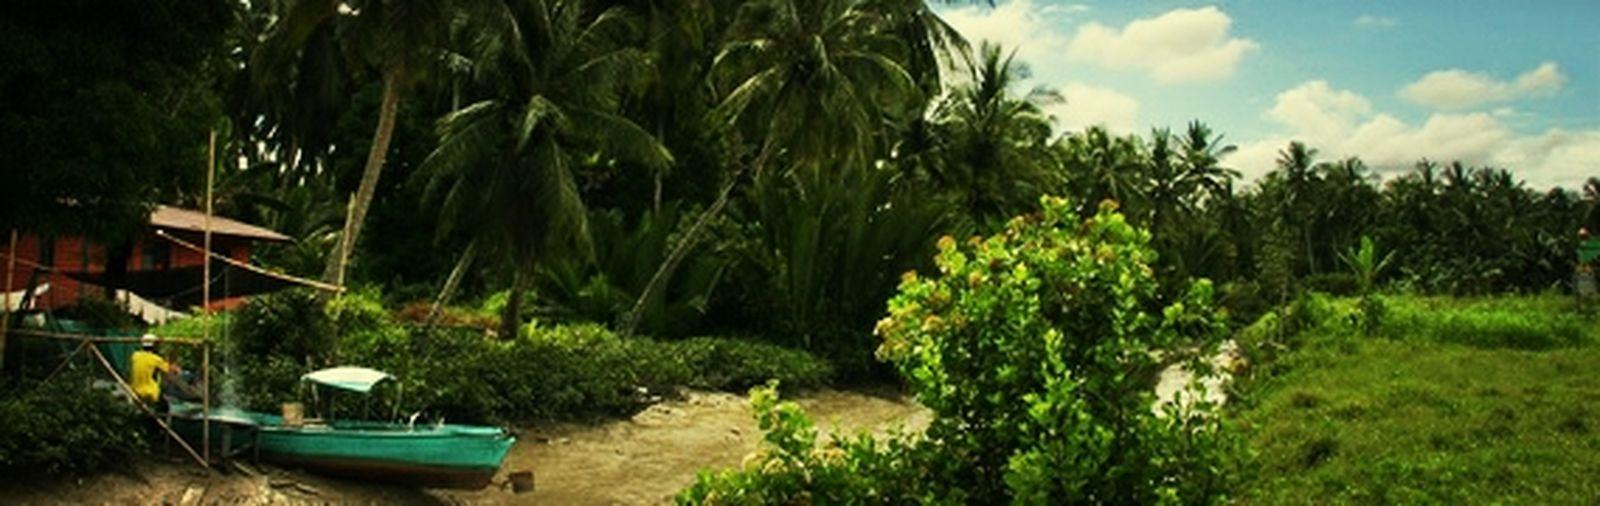 Kampung Sambir Pandang Sari Keindahan Alam Keindahan Natural View